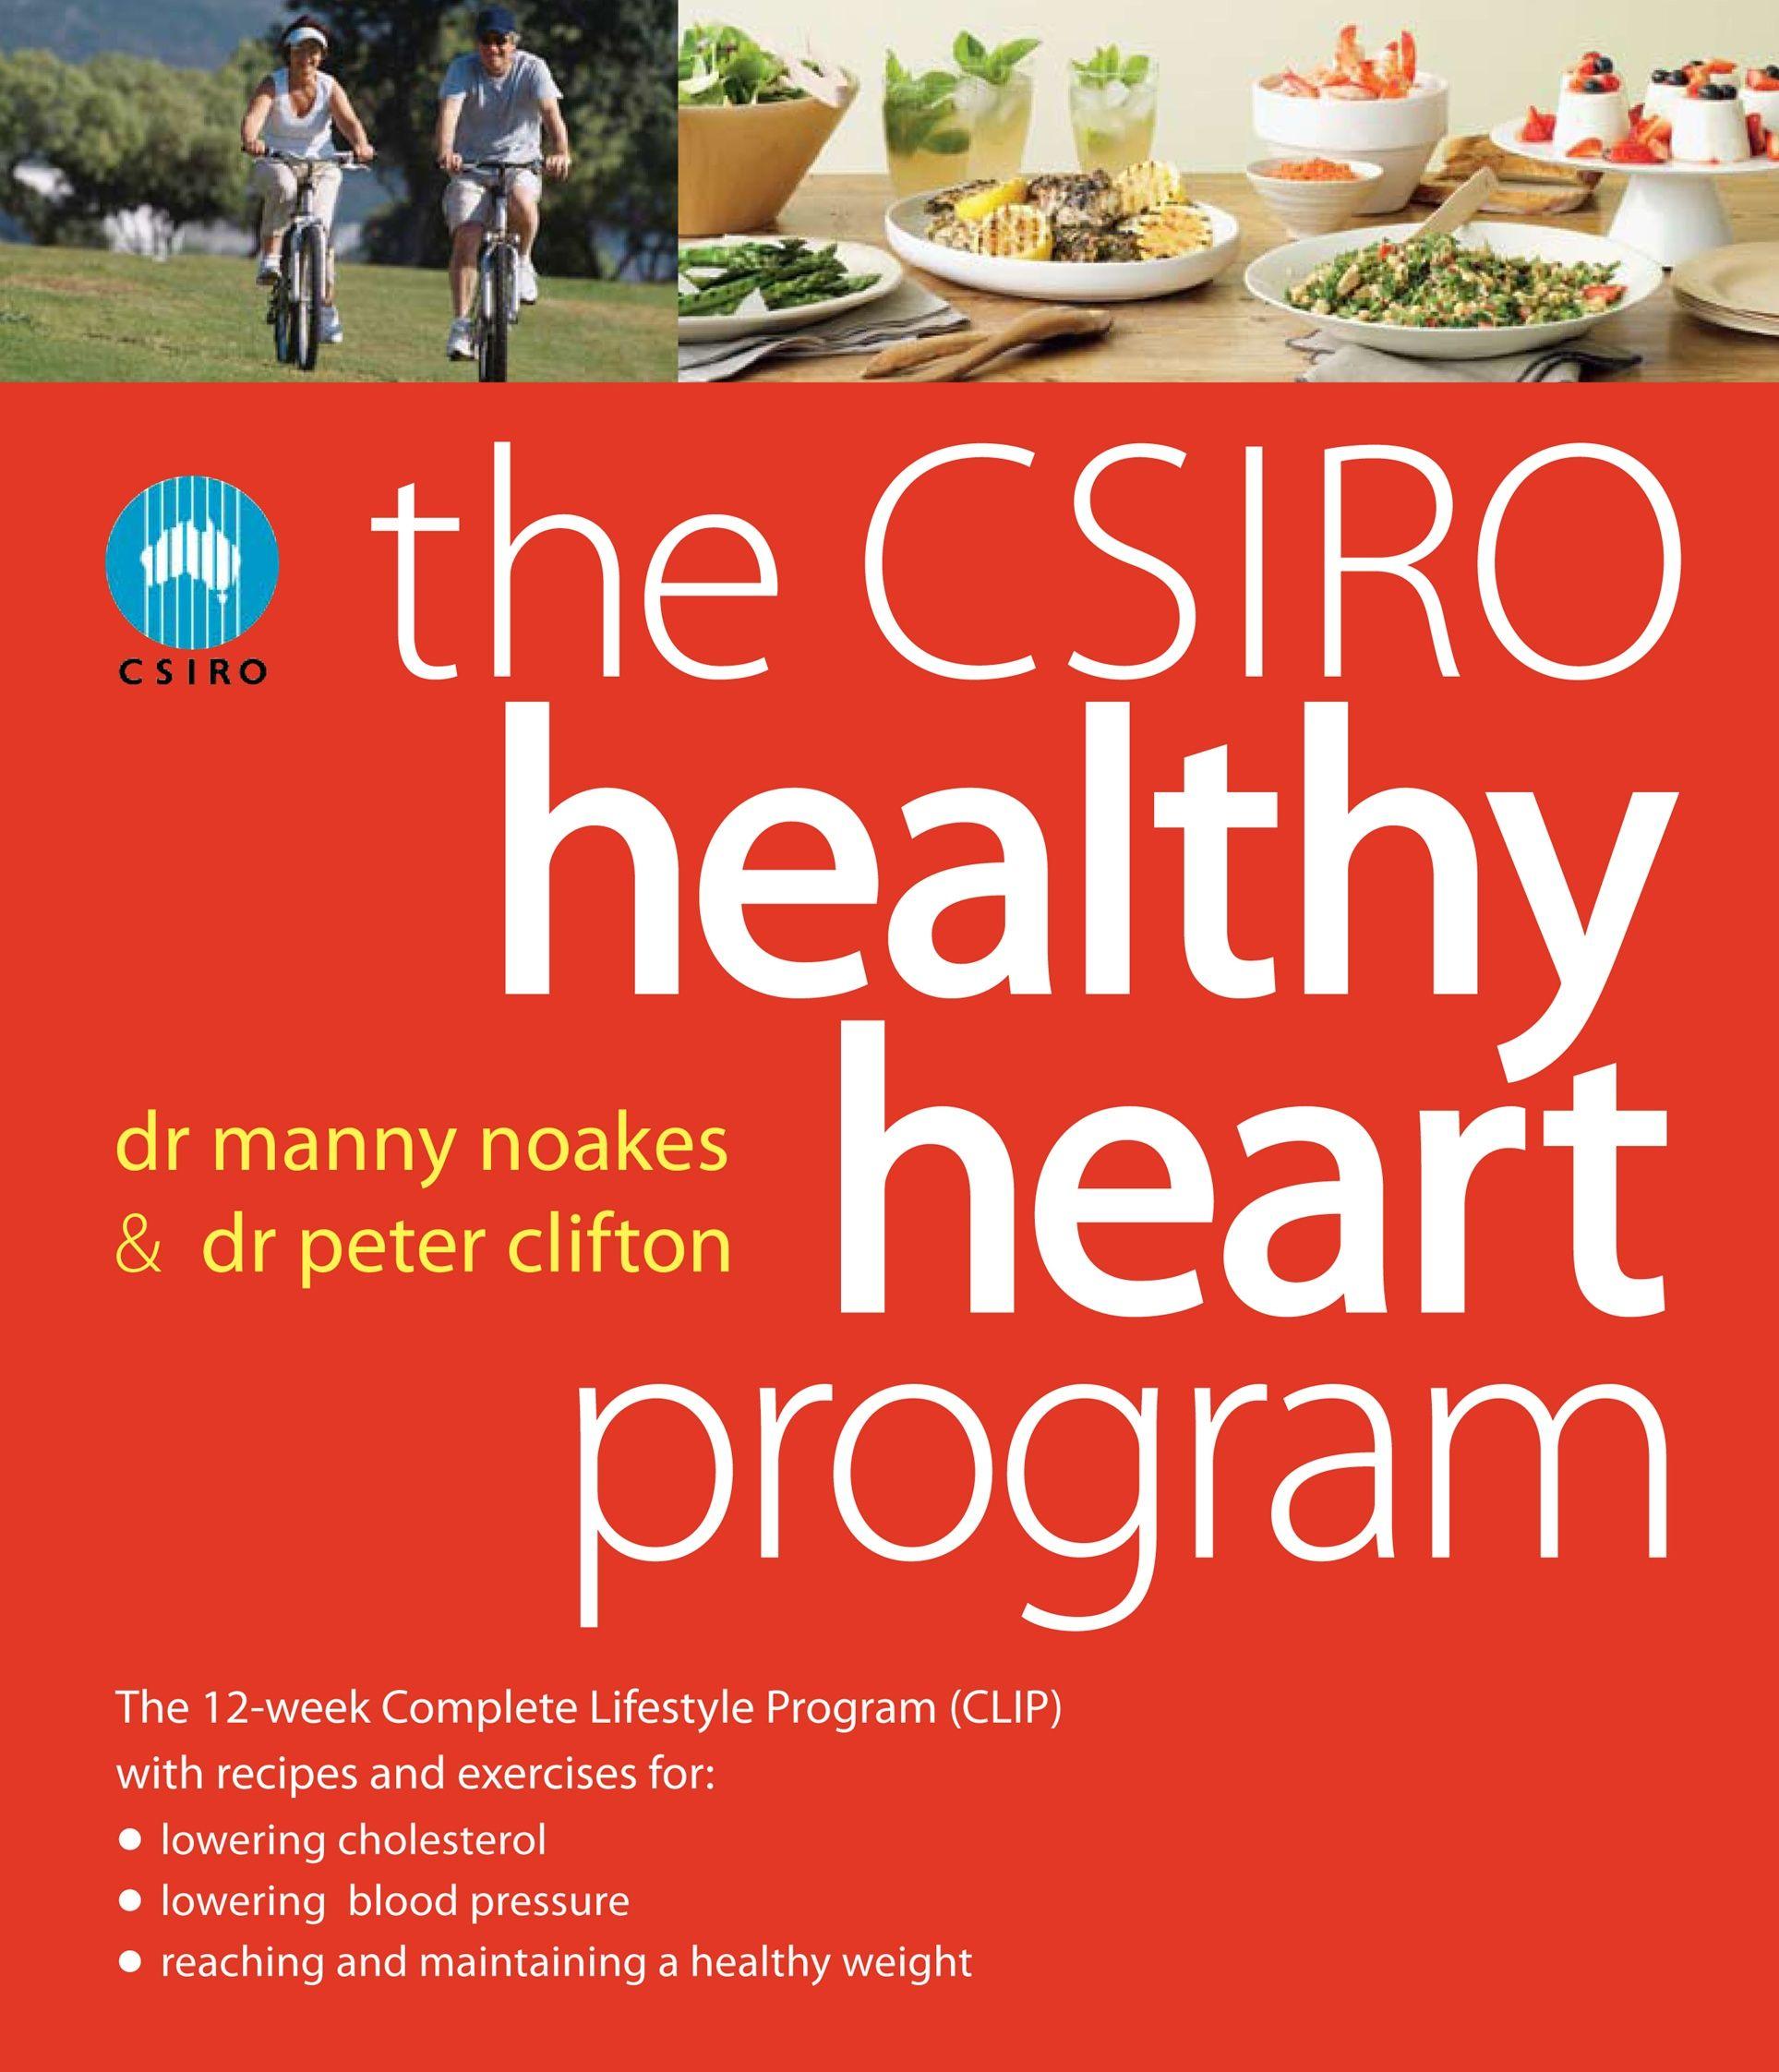 CSIRO Healthy Heart Program: AU $34.95